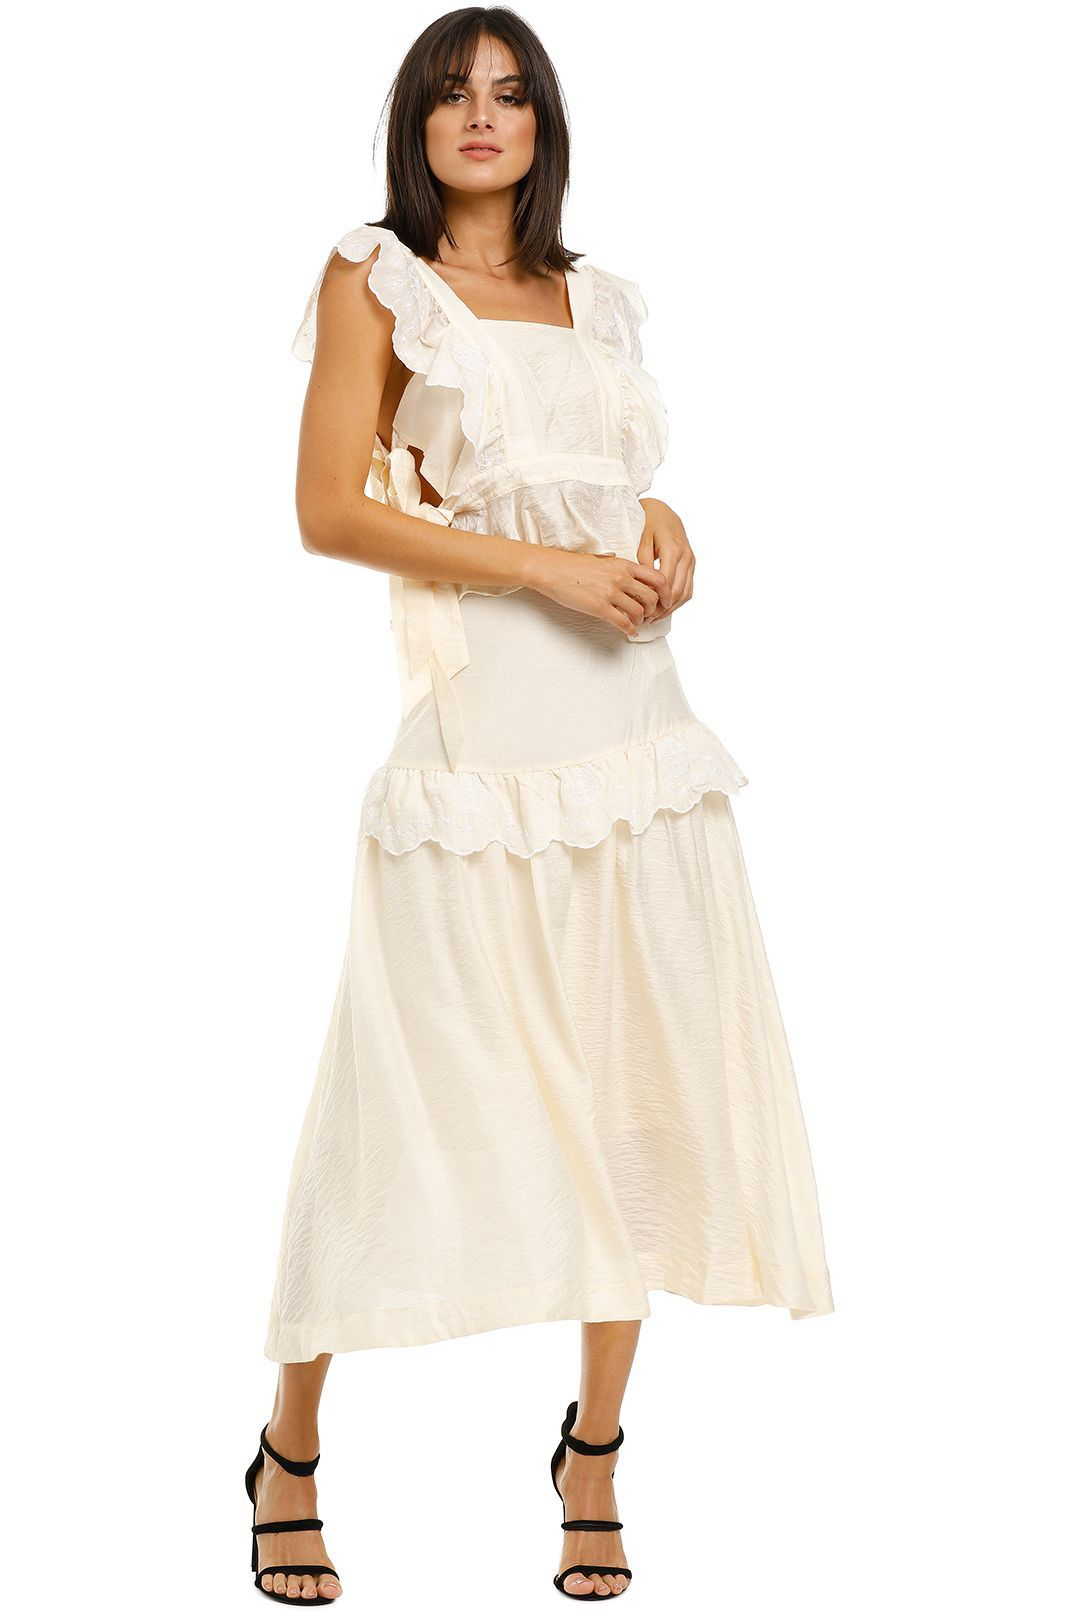 keepsake-the-label-high-hopes-top-and-skirt-set-vanilla-front